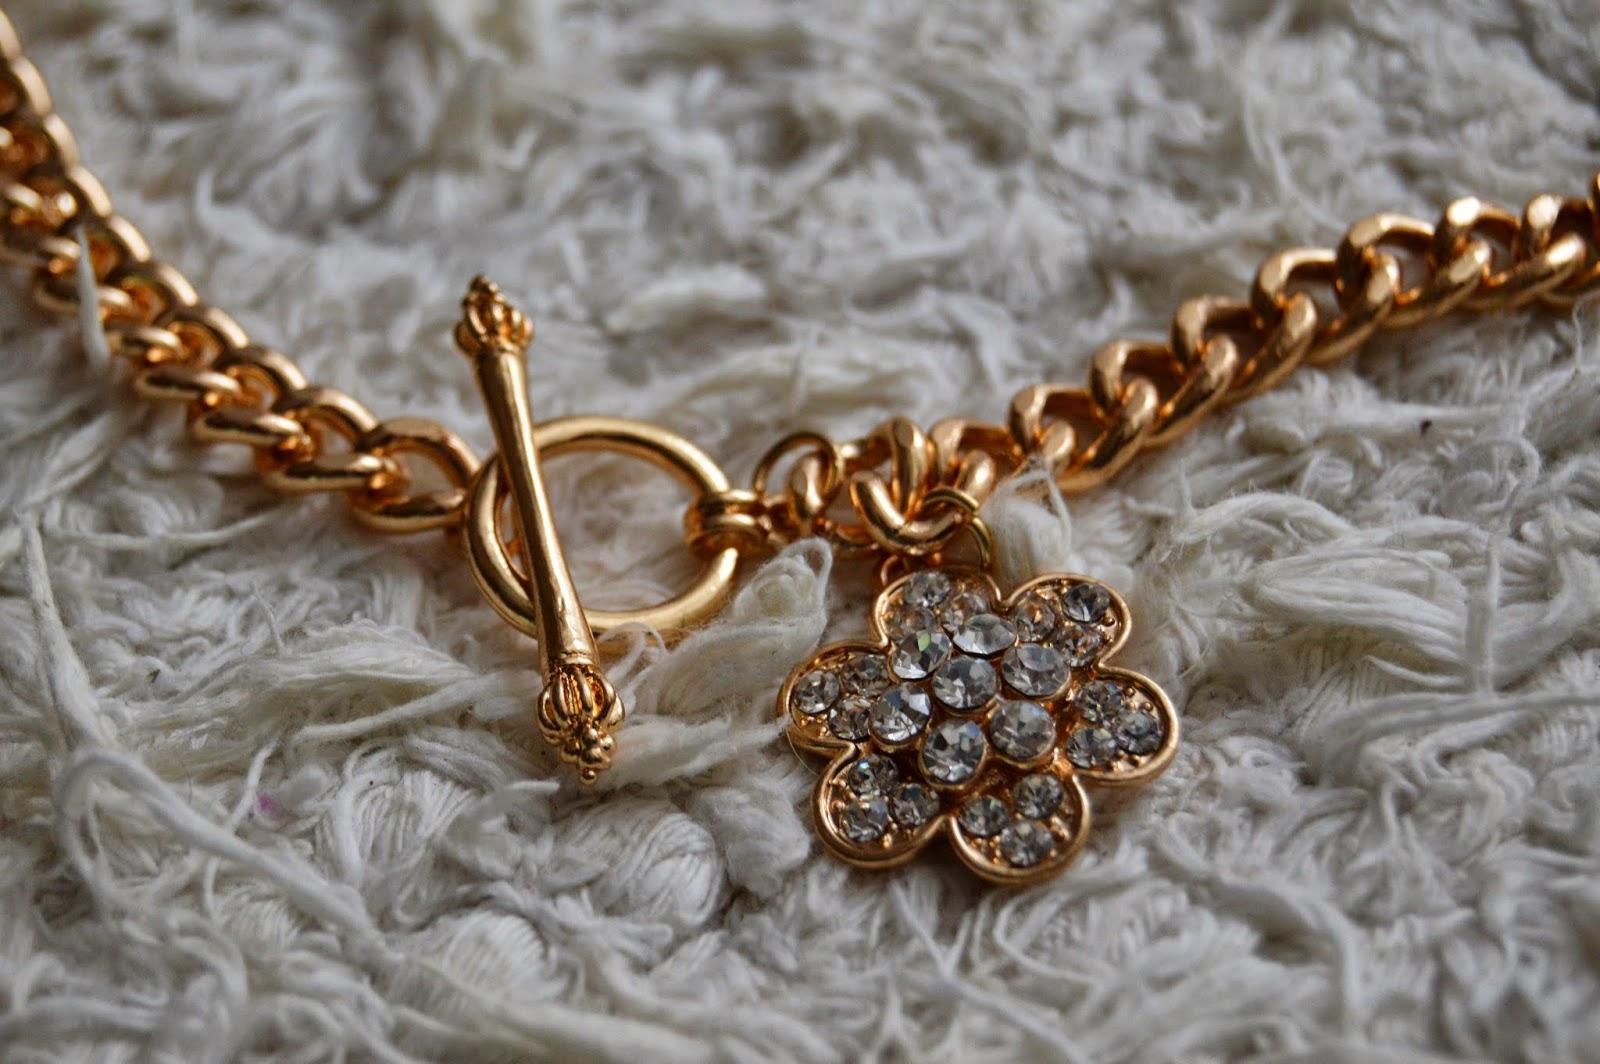 http://www.bornprettystore.com/necklaces-c-207_212.html?page=5